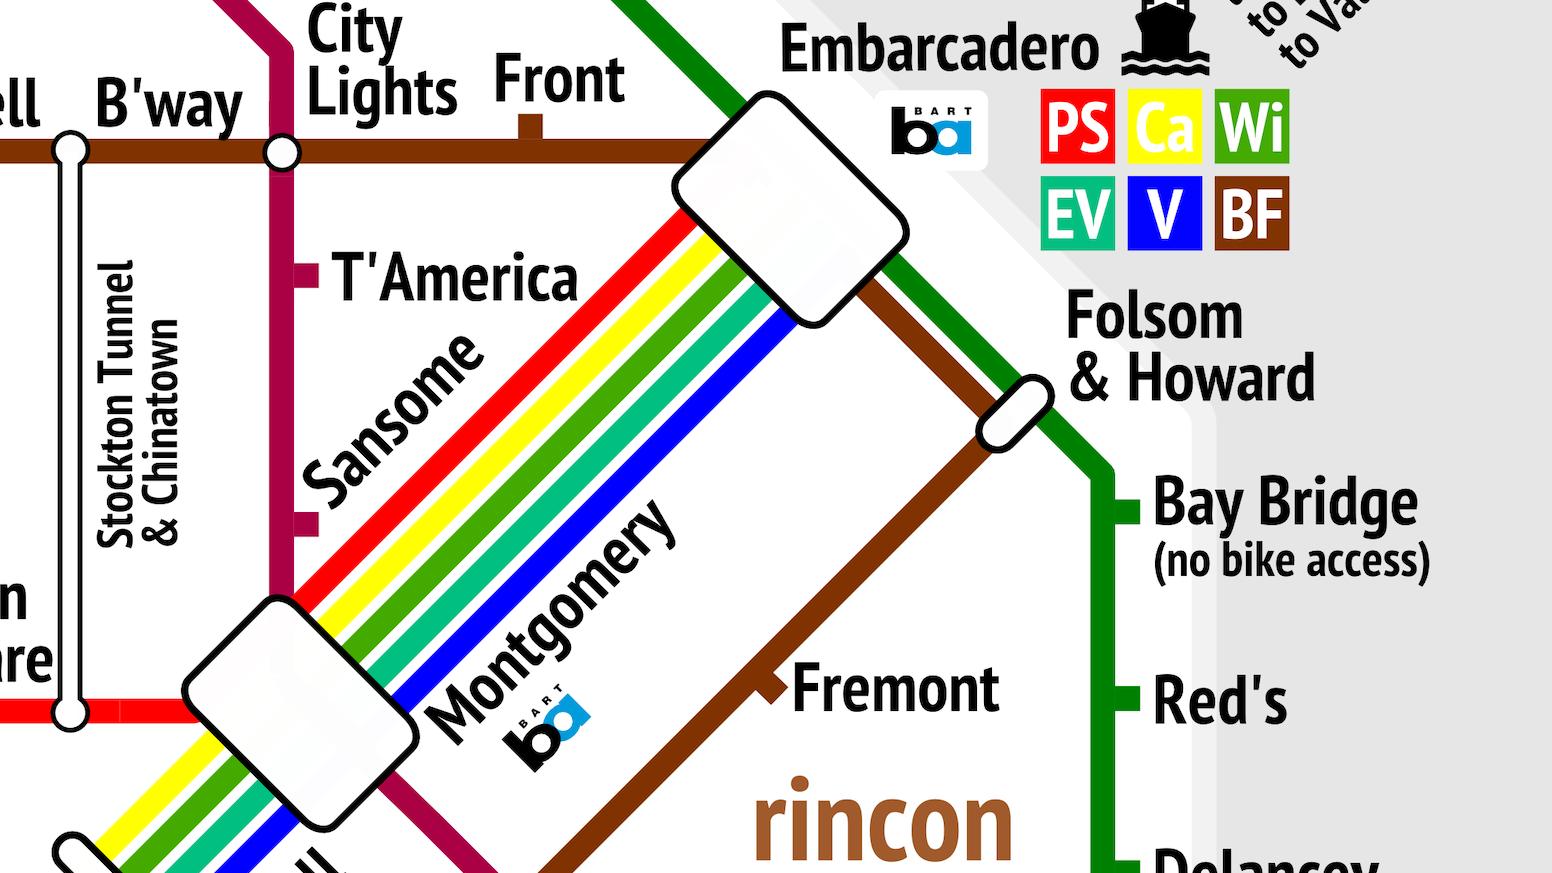 The San Francisco Bicycle System by Mat Kladney — Kickstarter San Francisco Subway Map on l.a. subway map, berlin subway map, new york new york subway map, mobile subway map, hannover subway map, hunters point subway map, dallas subway map, tennessee subway map, nashville subway map, hong kong mtr subway map, lima subway map, toronto subway map, tokyo subway map, pudong subway map, medellin subway map, florida subway map, seattle subway map, dresden subway map, far rockaway subway map, tel aviv subway map,